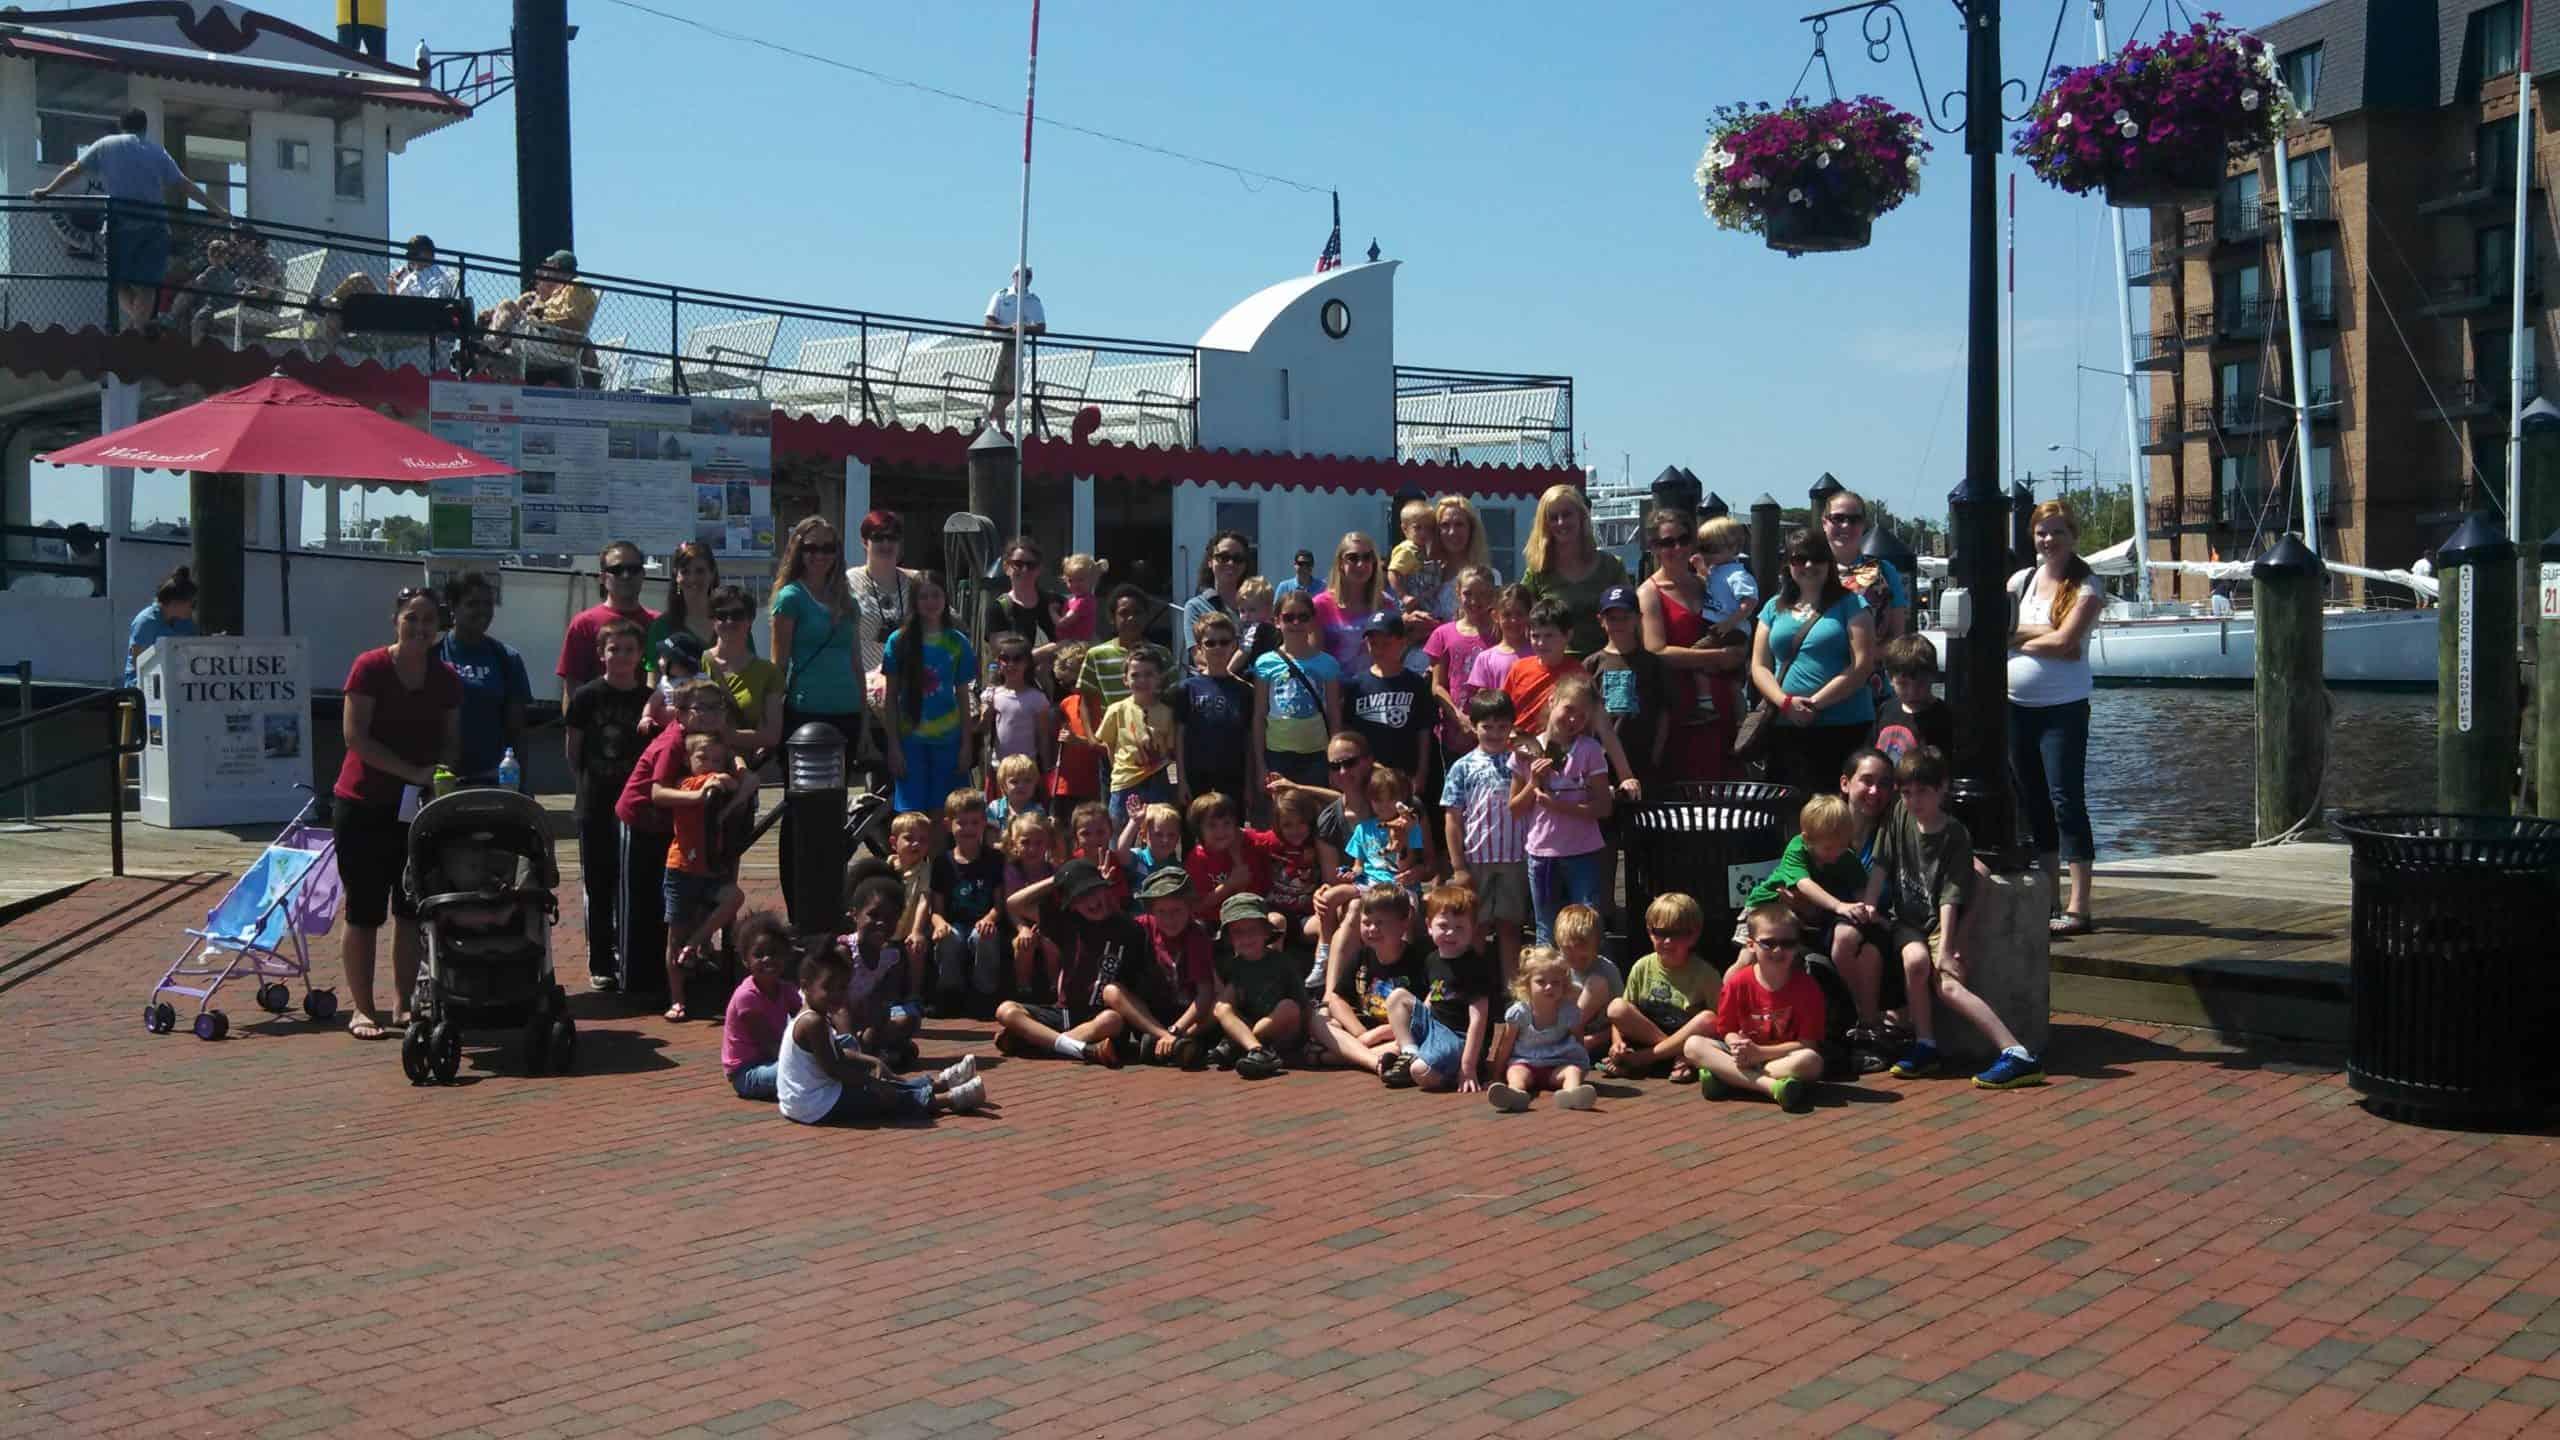 Field Trip Club at Annapolis Dock